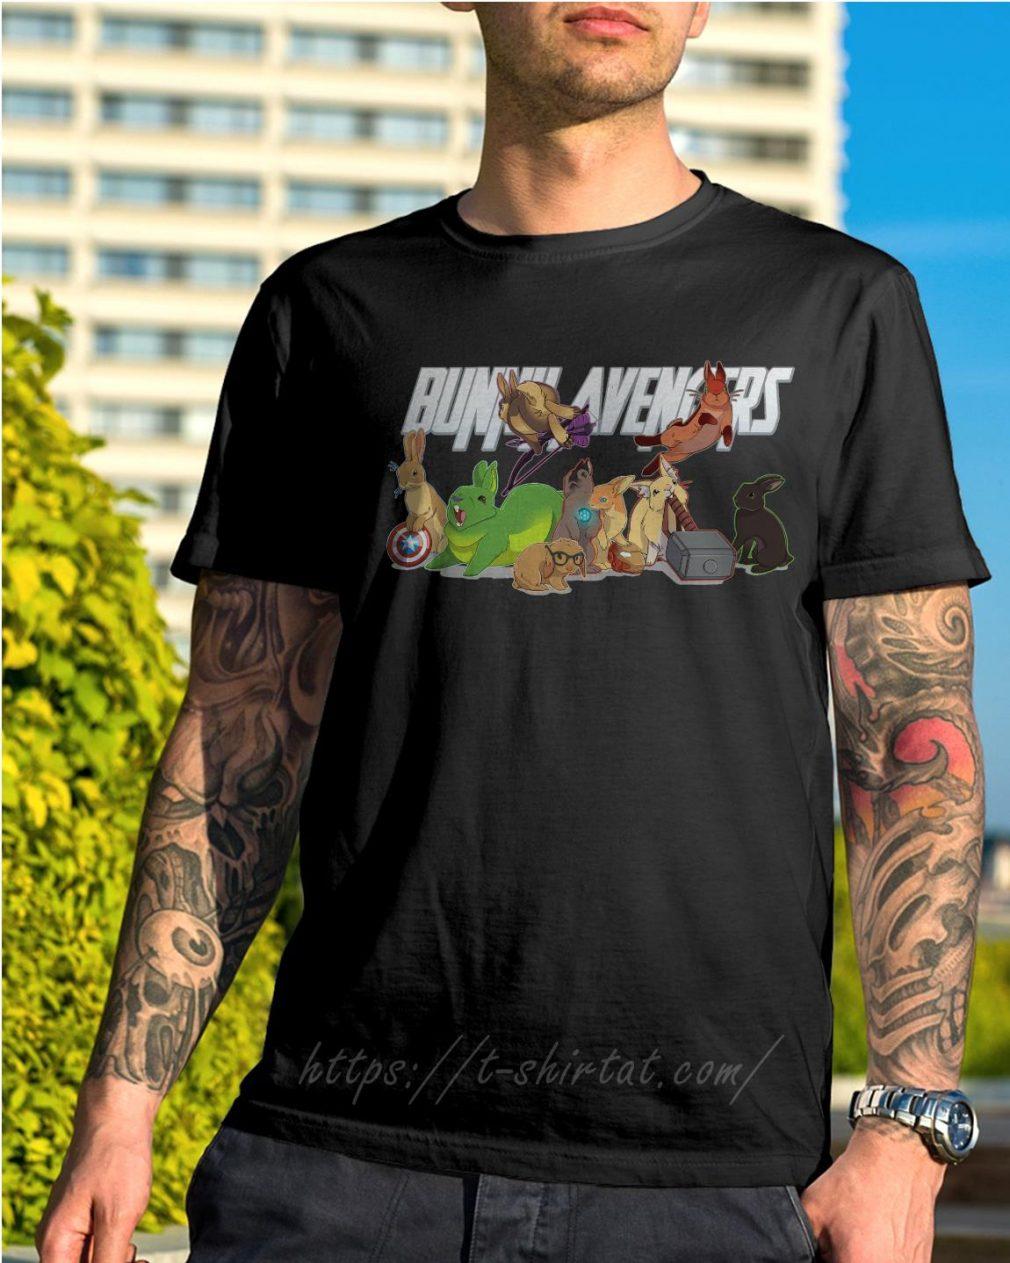 Bunny avengers shirt